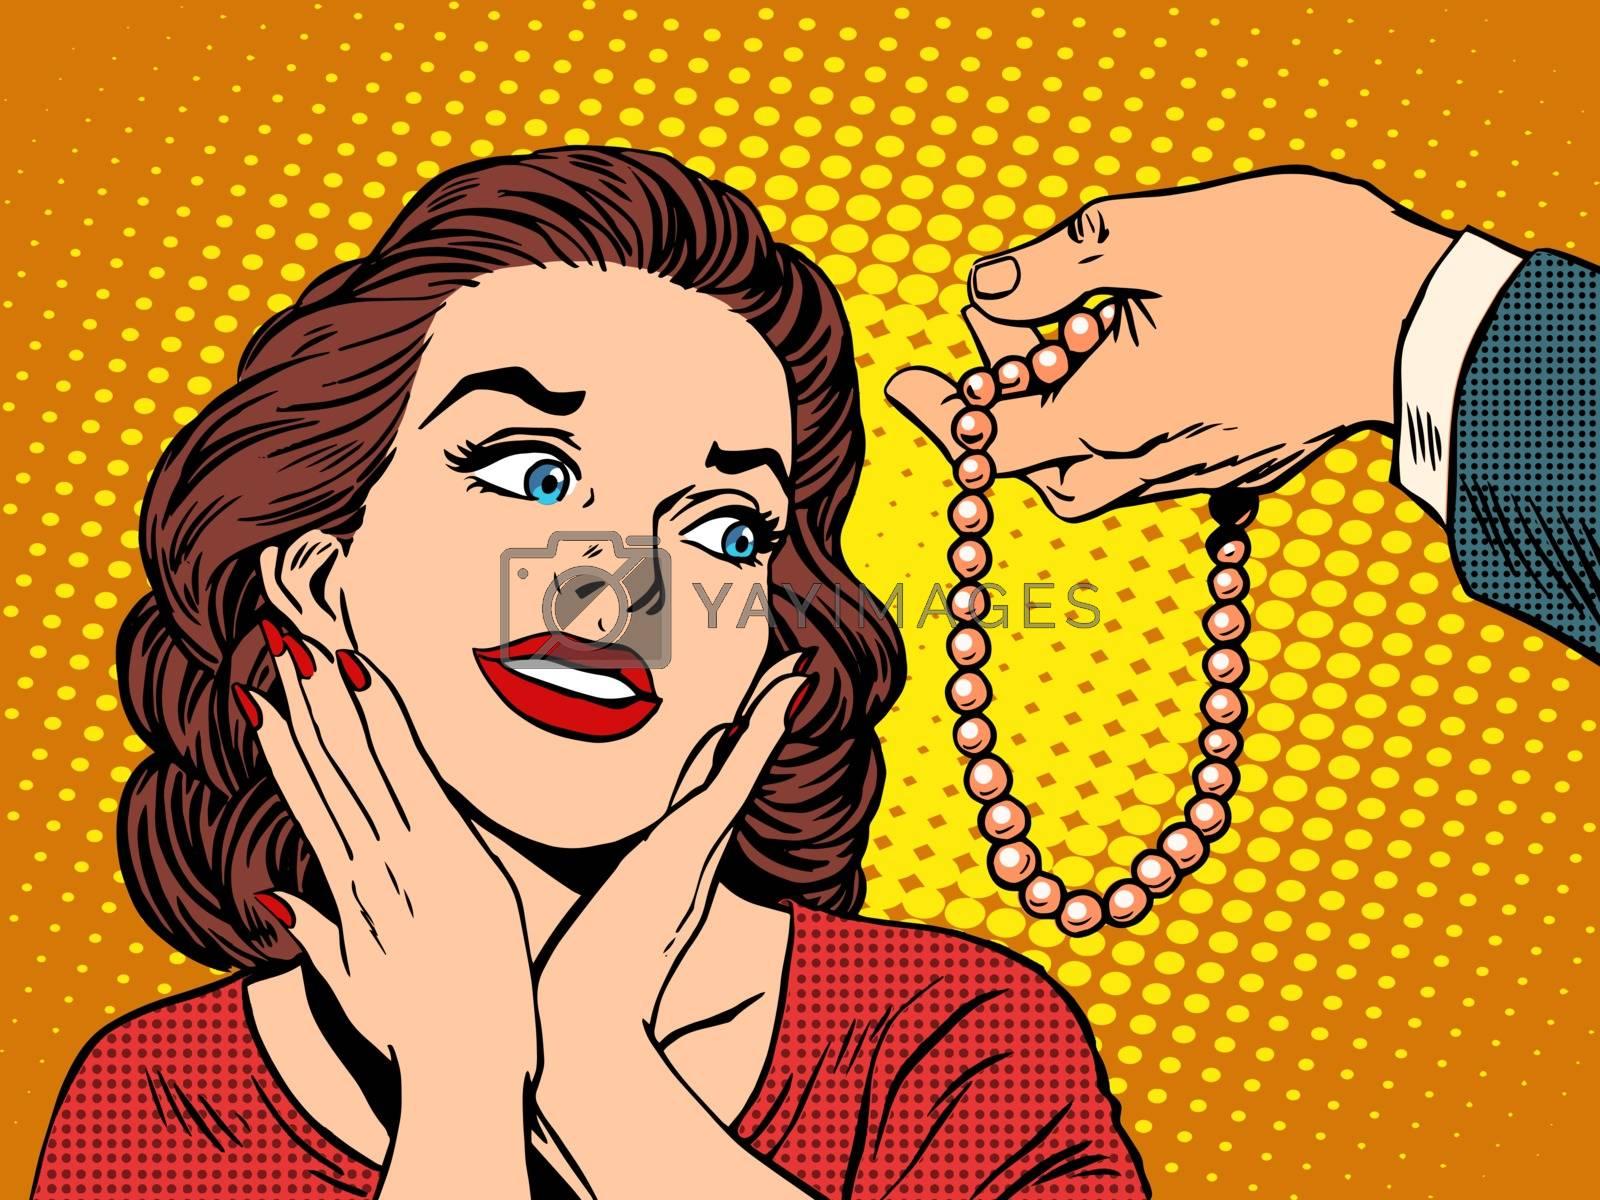 Gift woman jewelry beads pop art retro style. Birthday celebration joy